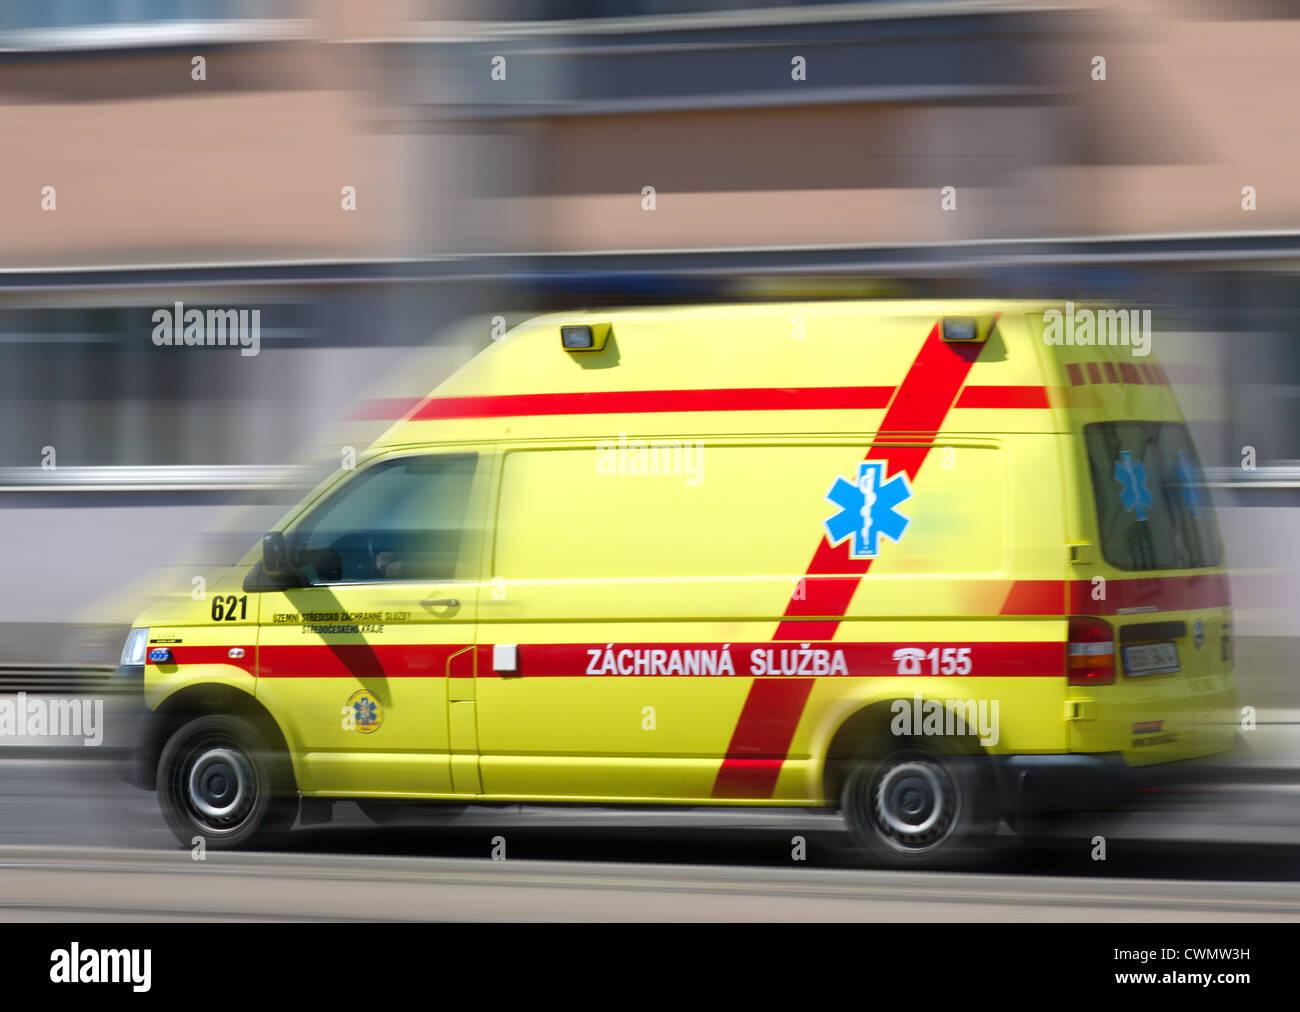 Ceska sanitka - Czech ambulance car - Zachranna sluzba - Stock Image